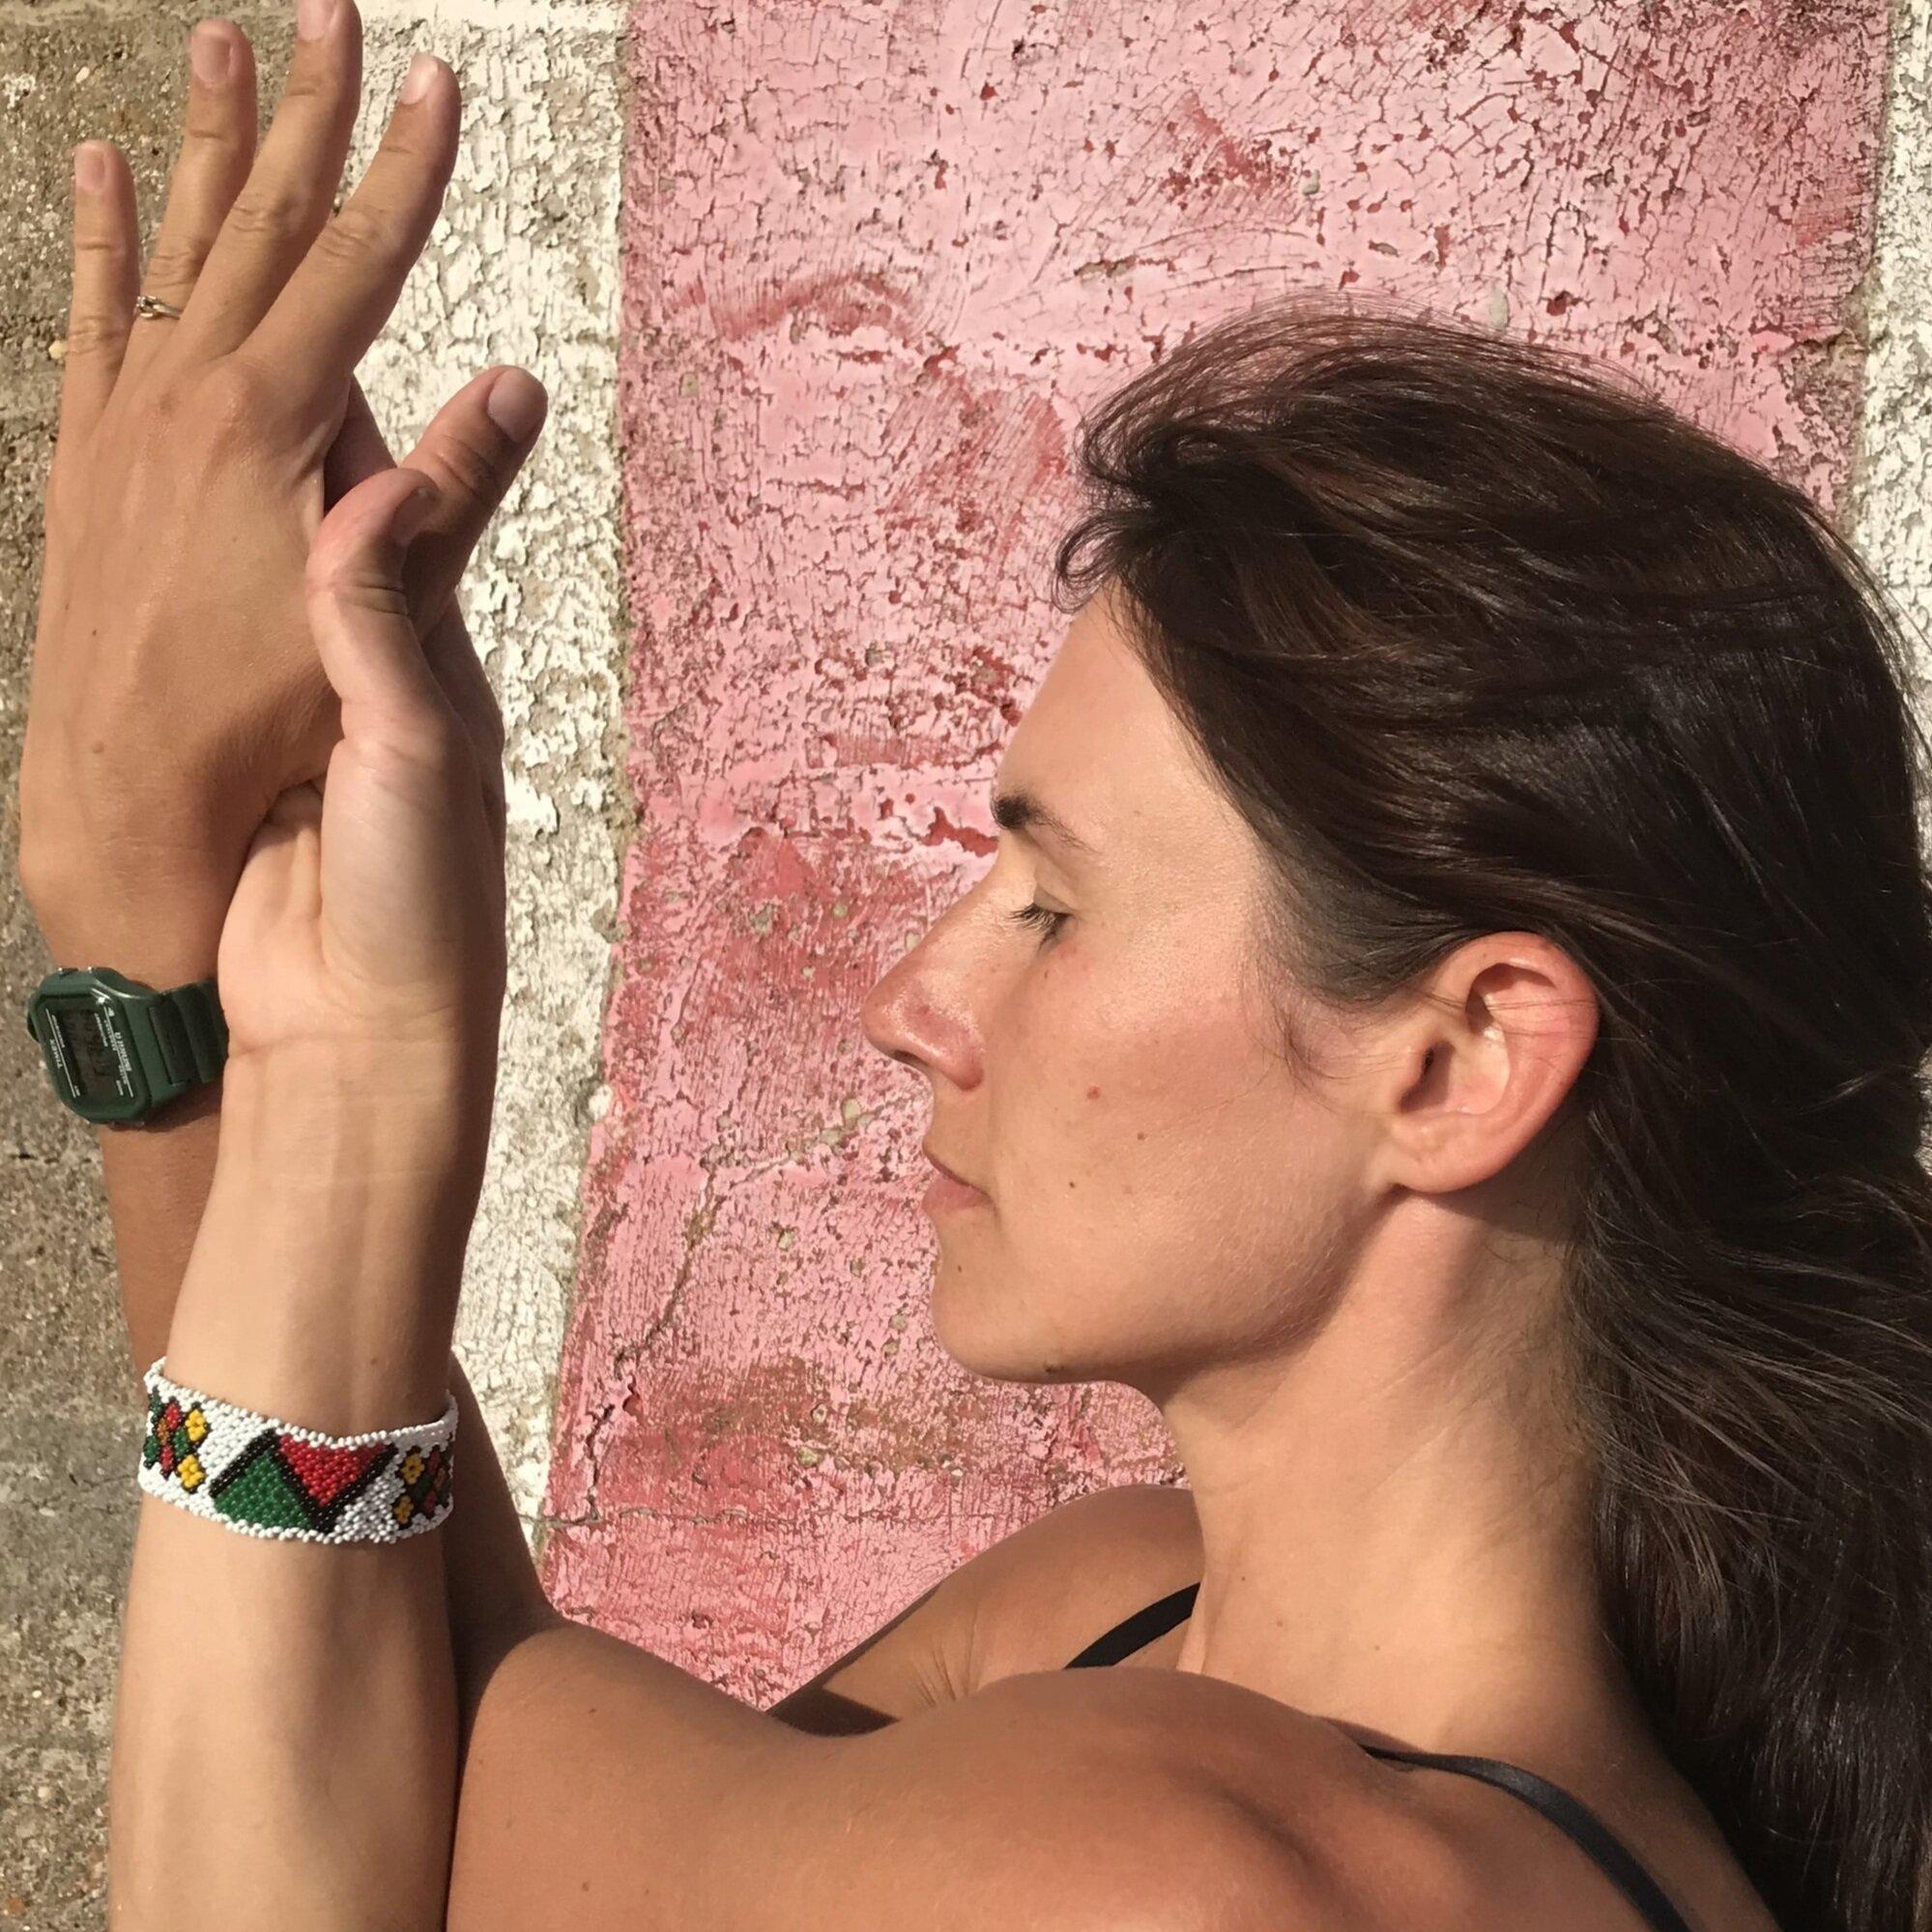 Ewa teaches hatha yoga every Wednesday at St Clement's Farm